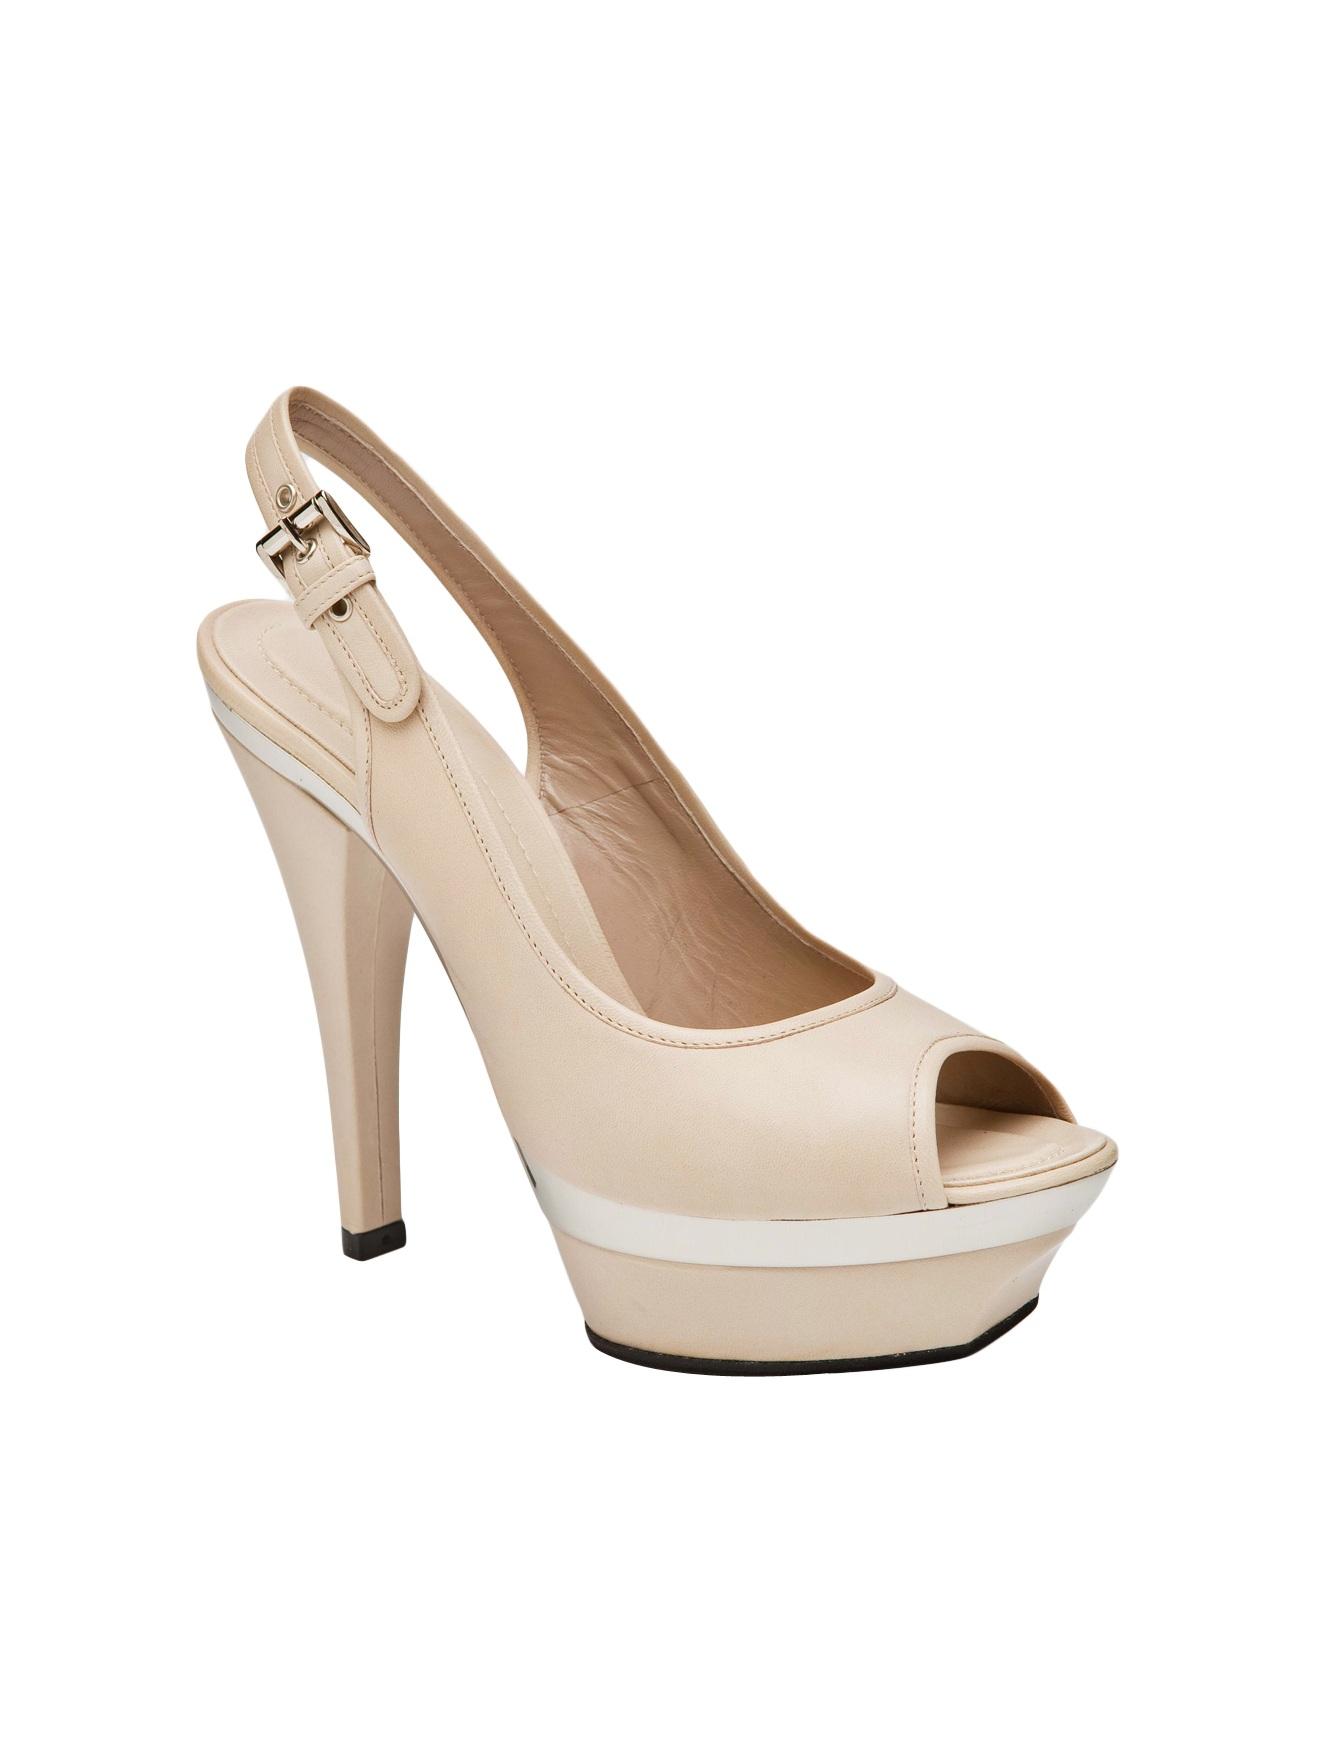 barbara bui high heel slingbacks in beige cream lyst. Black Bedroom Furniture Sets. Home Design Ideas